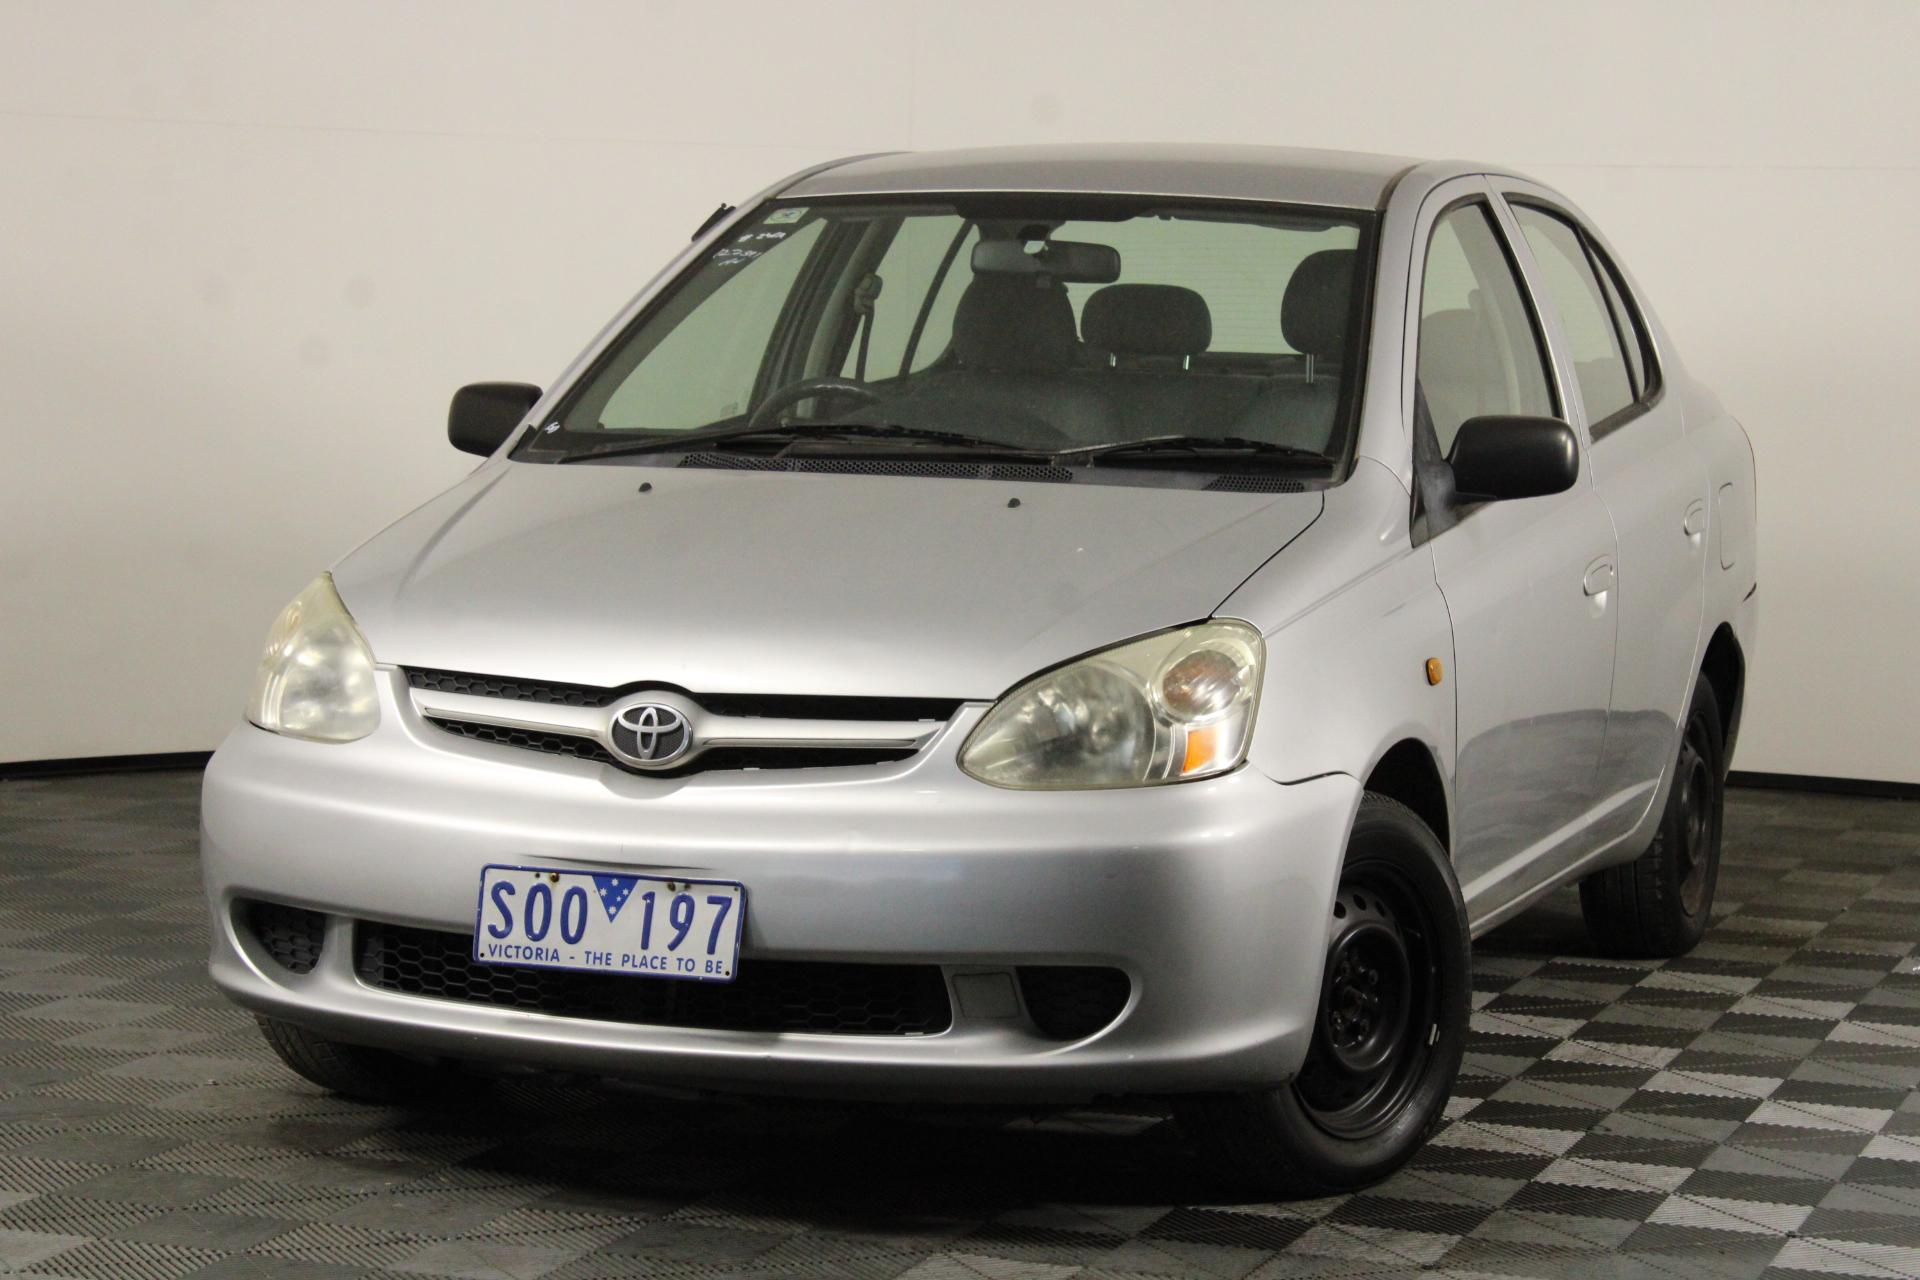 2003 Toyota Echo NCP12R Automatic Sedan